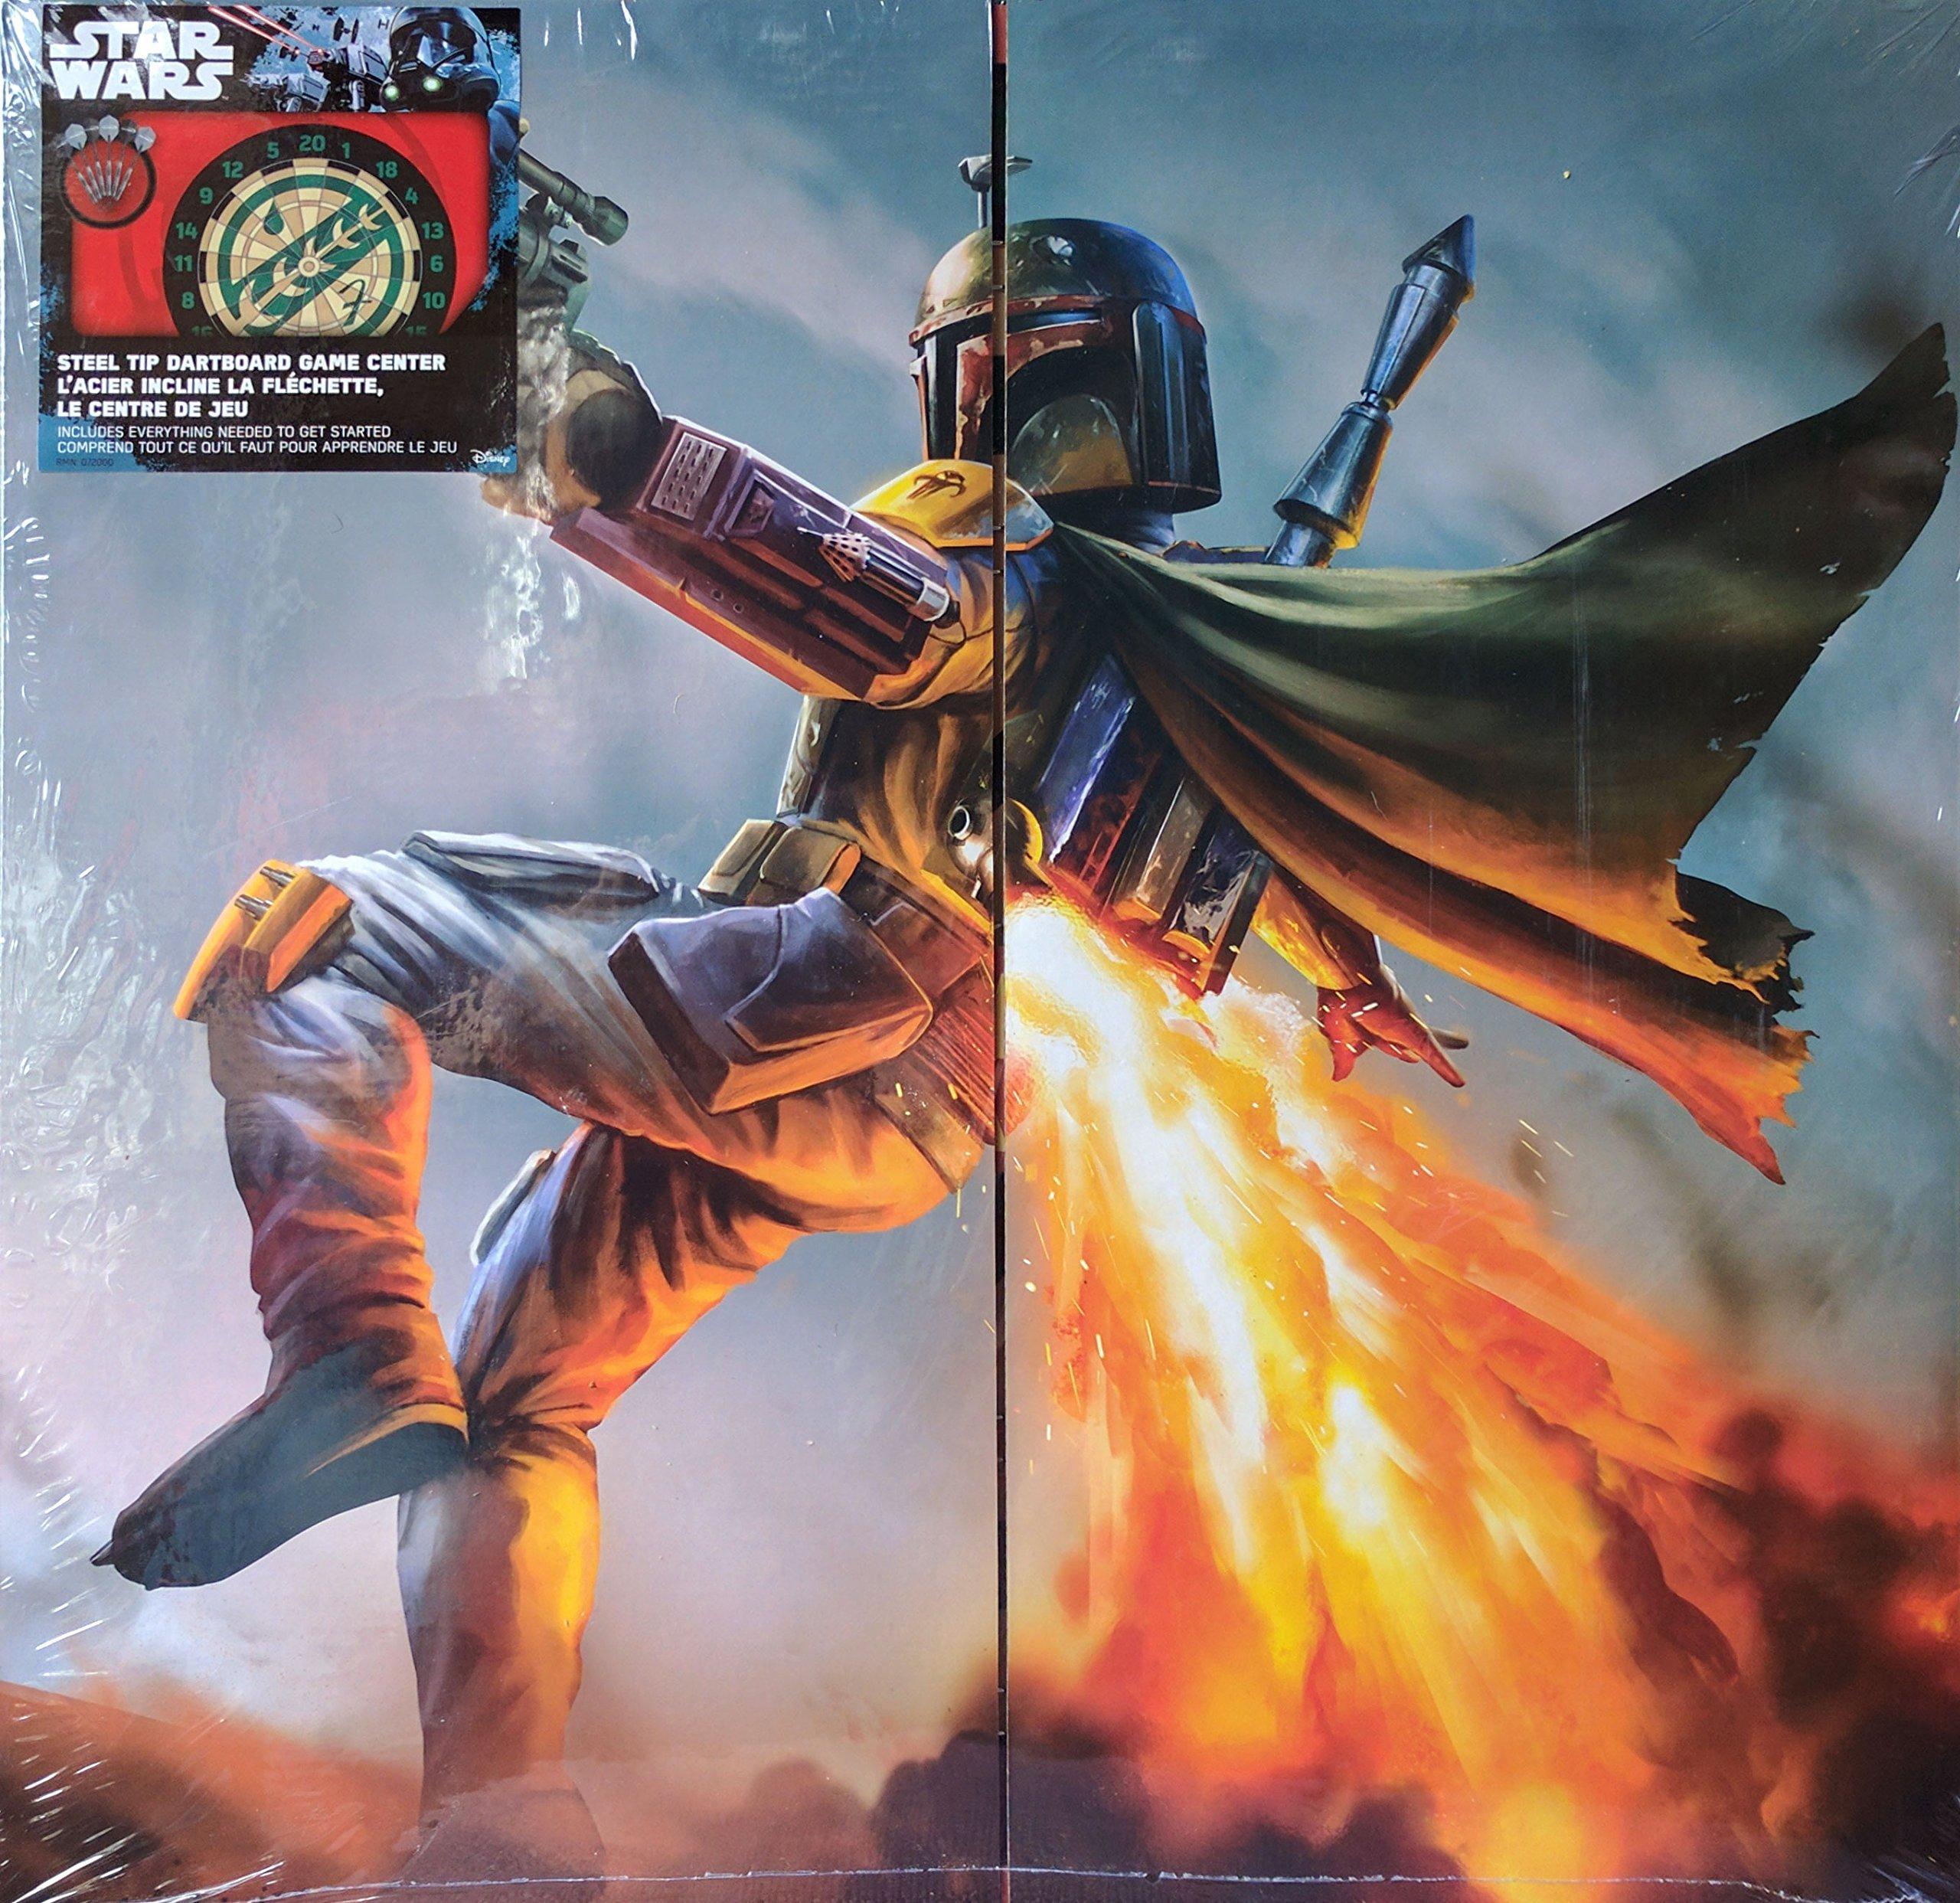 Star Wars, Steel Tip Dartboard Game Center (Boba Fett)